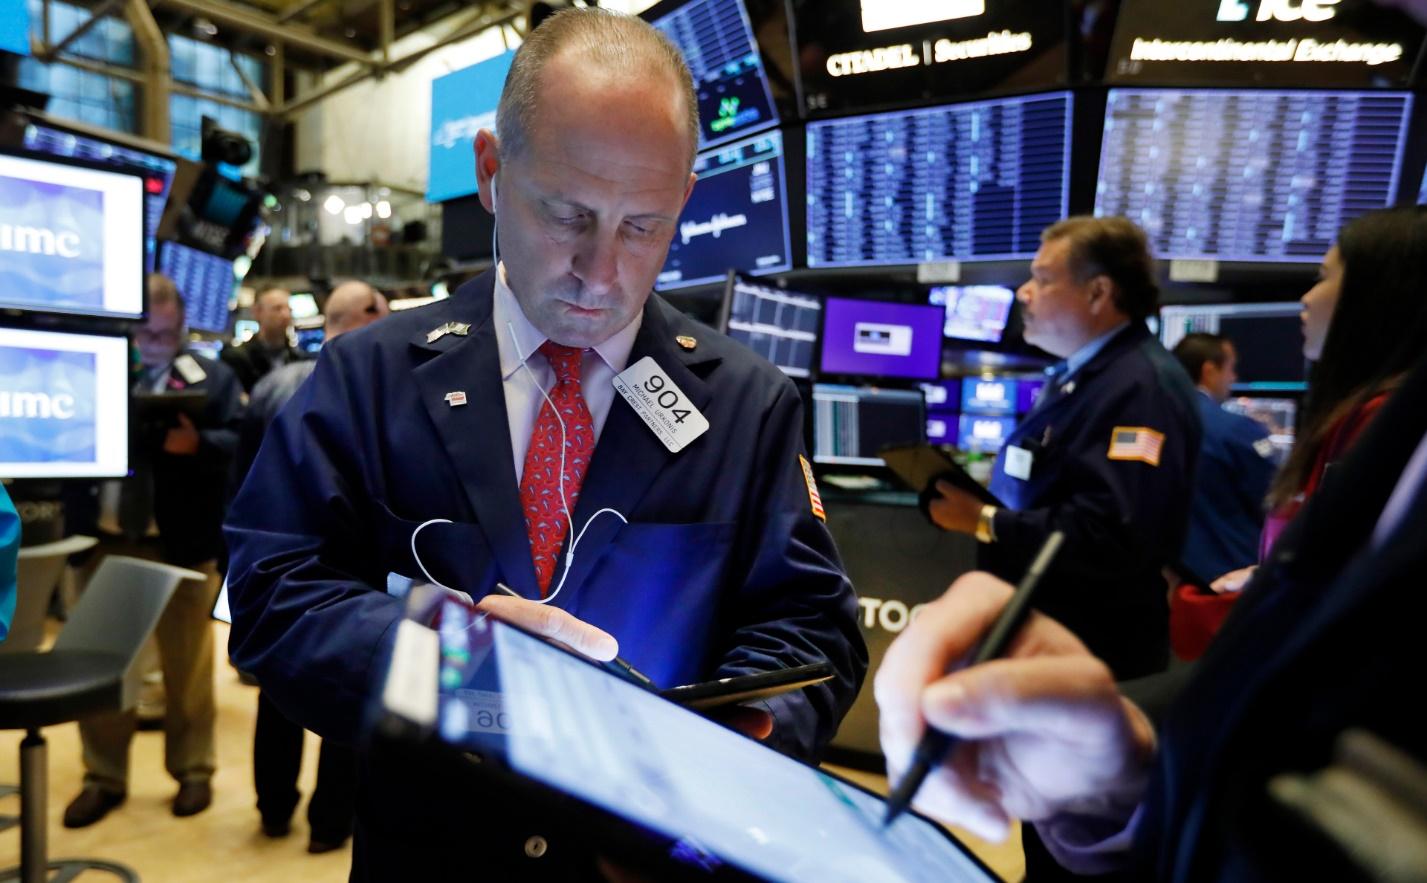 биржевой кризис влияние на рынок